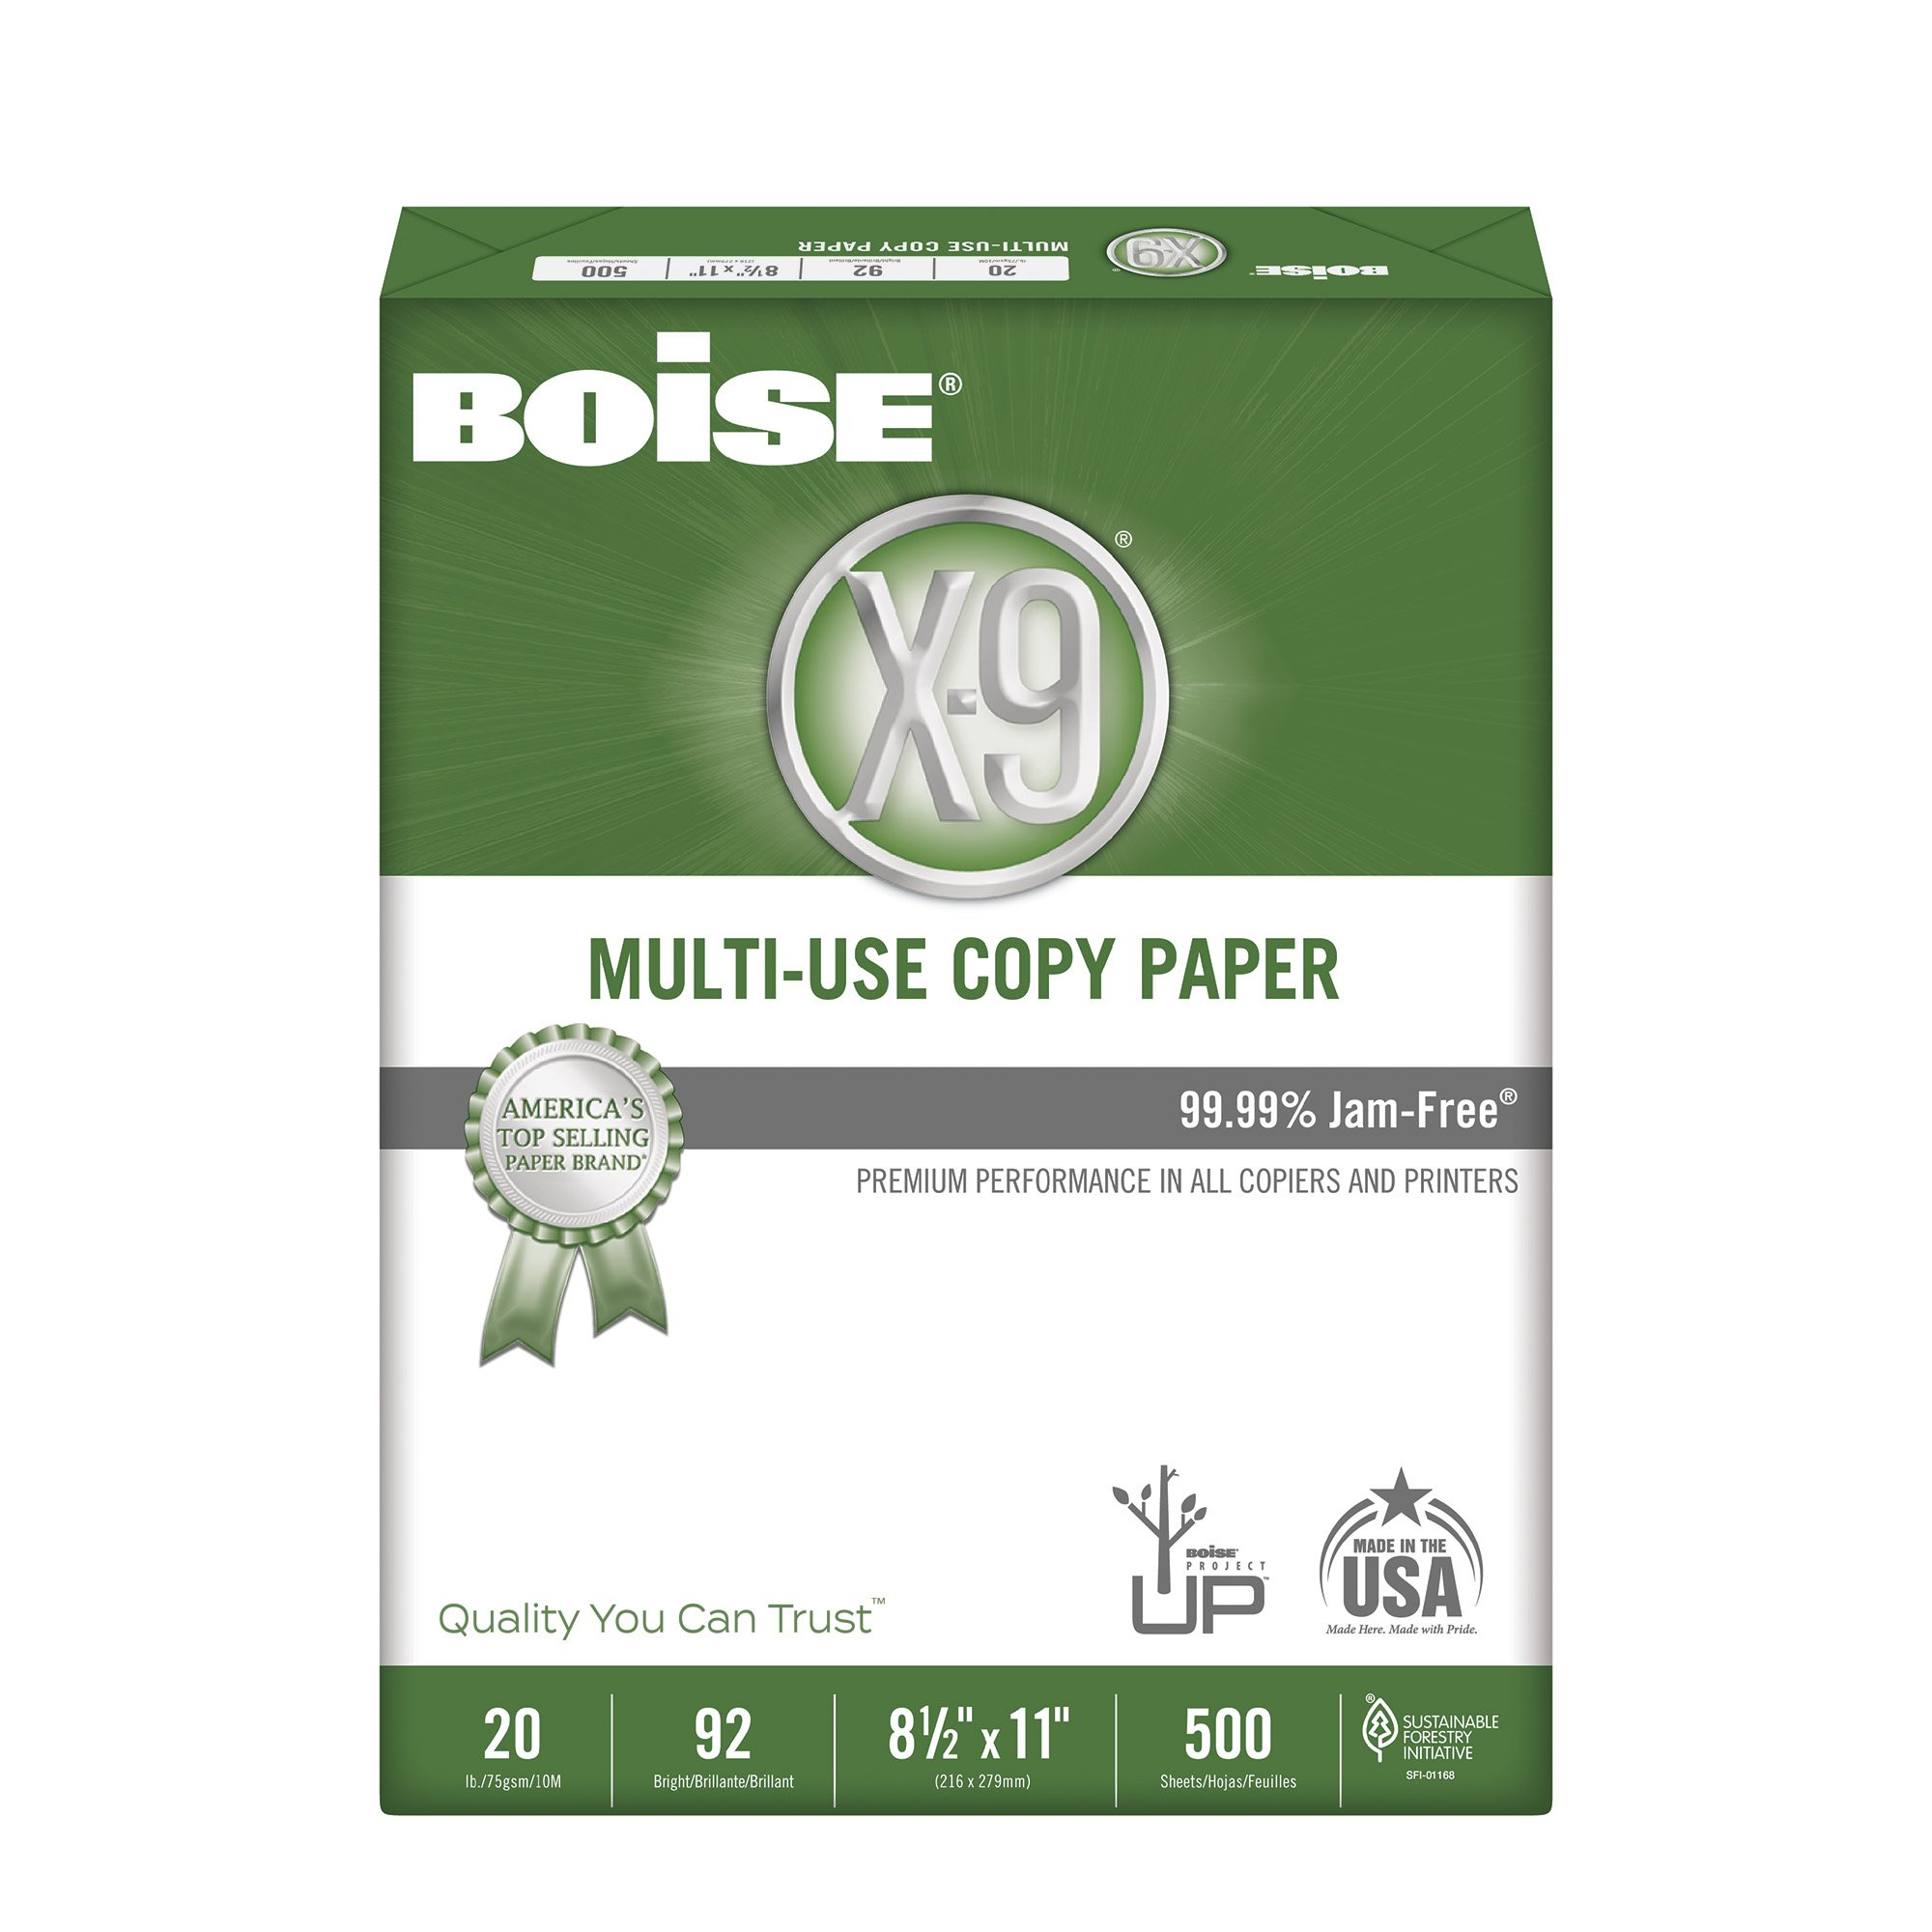 BOISE X-9 Multi-Use Copy Paper, 8.5 x 11, 92 Bright White, 20 lb, 3 ream carton (1,500 Sheets) by Boise Paper (Image #3)